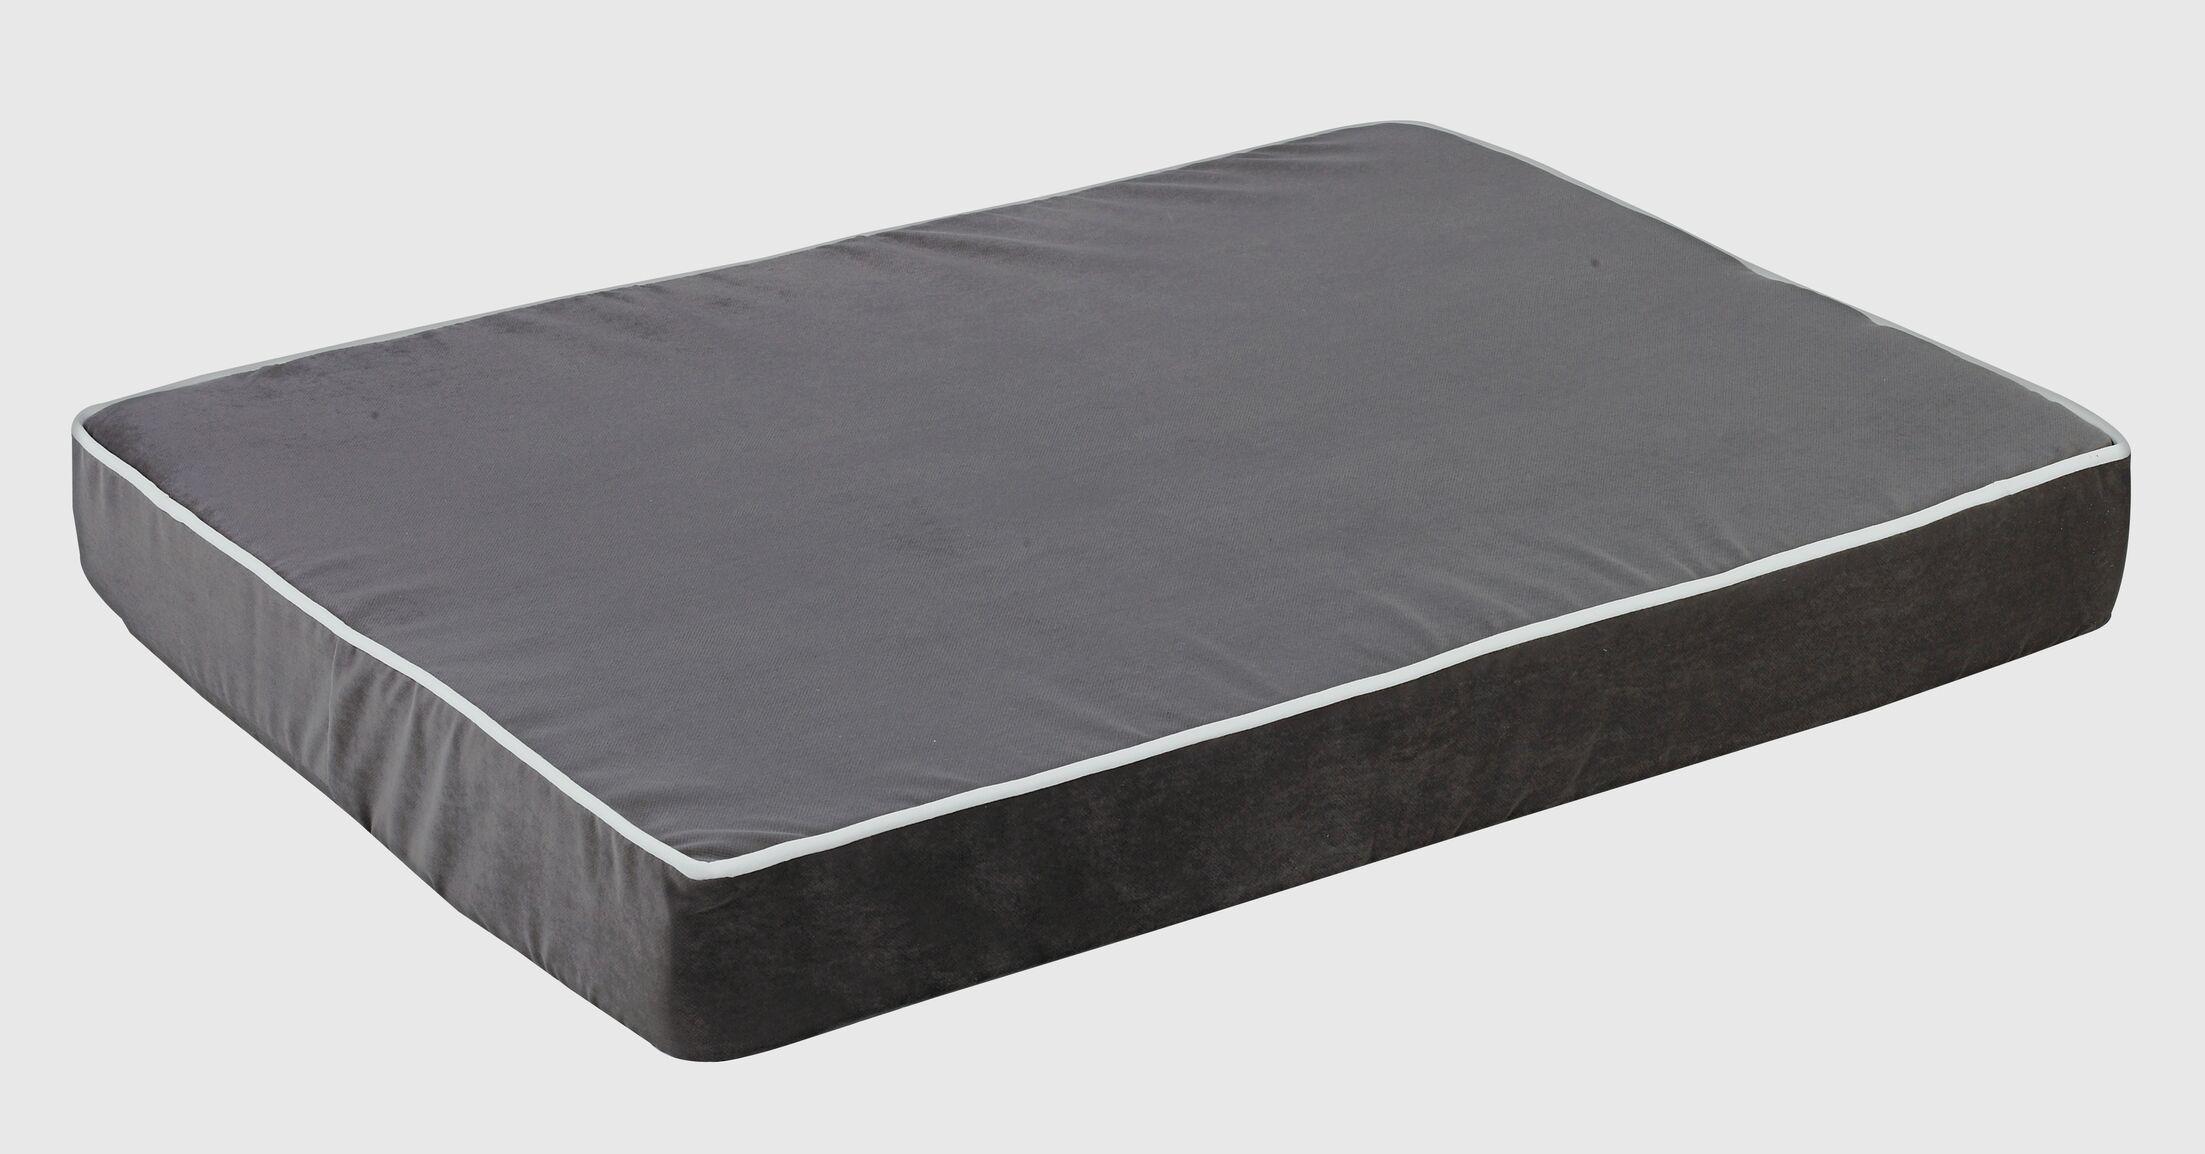 Isotonic Plat Microvelvet Dog Foam Mattress Size: Medium (30